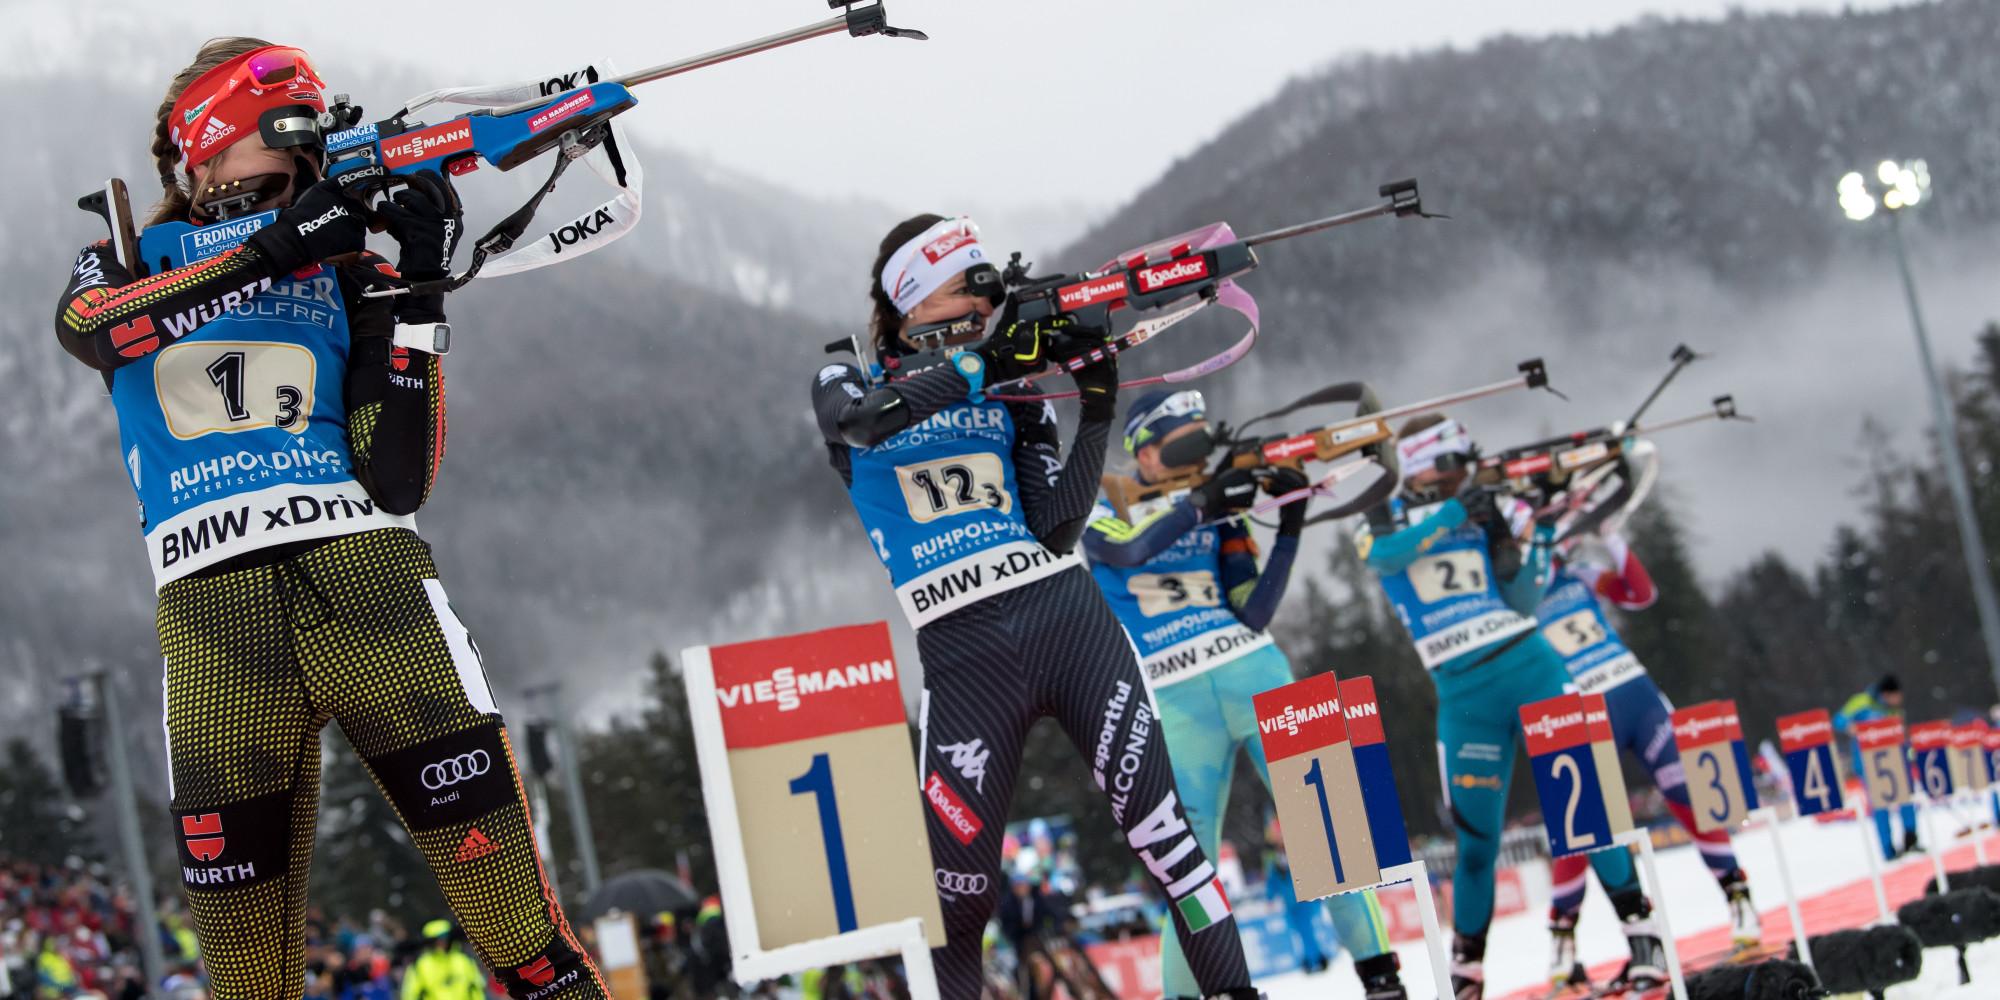 livestream biathlon